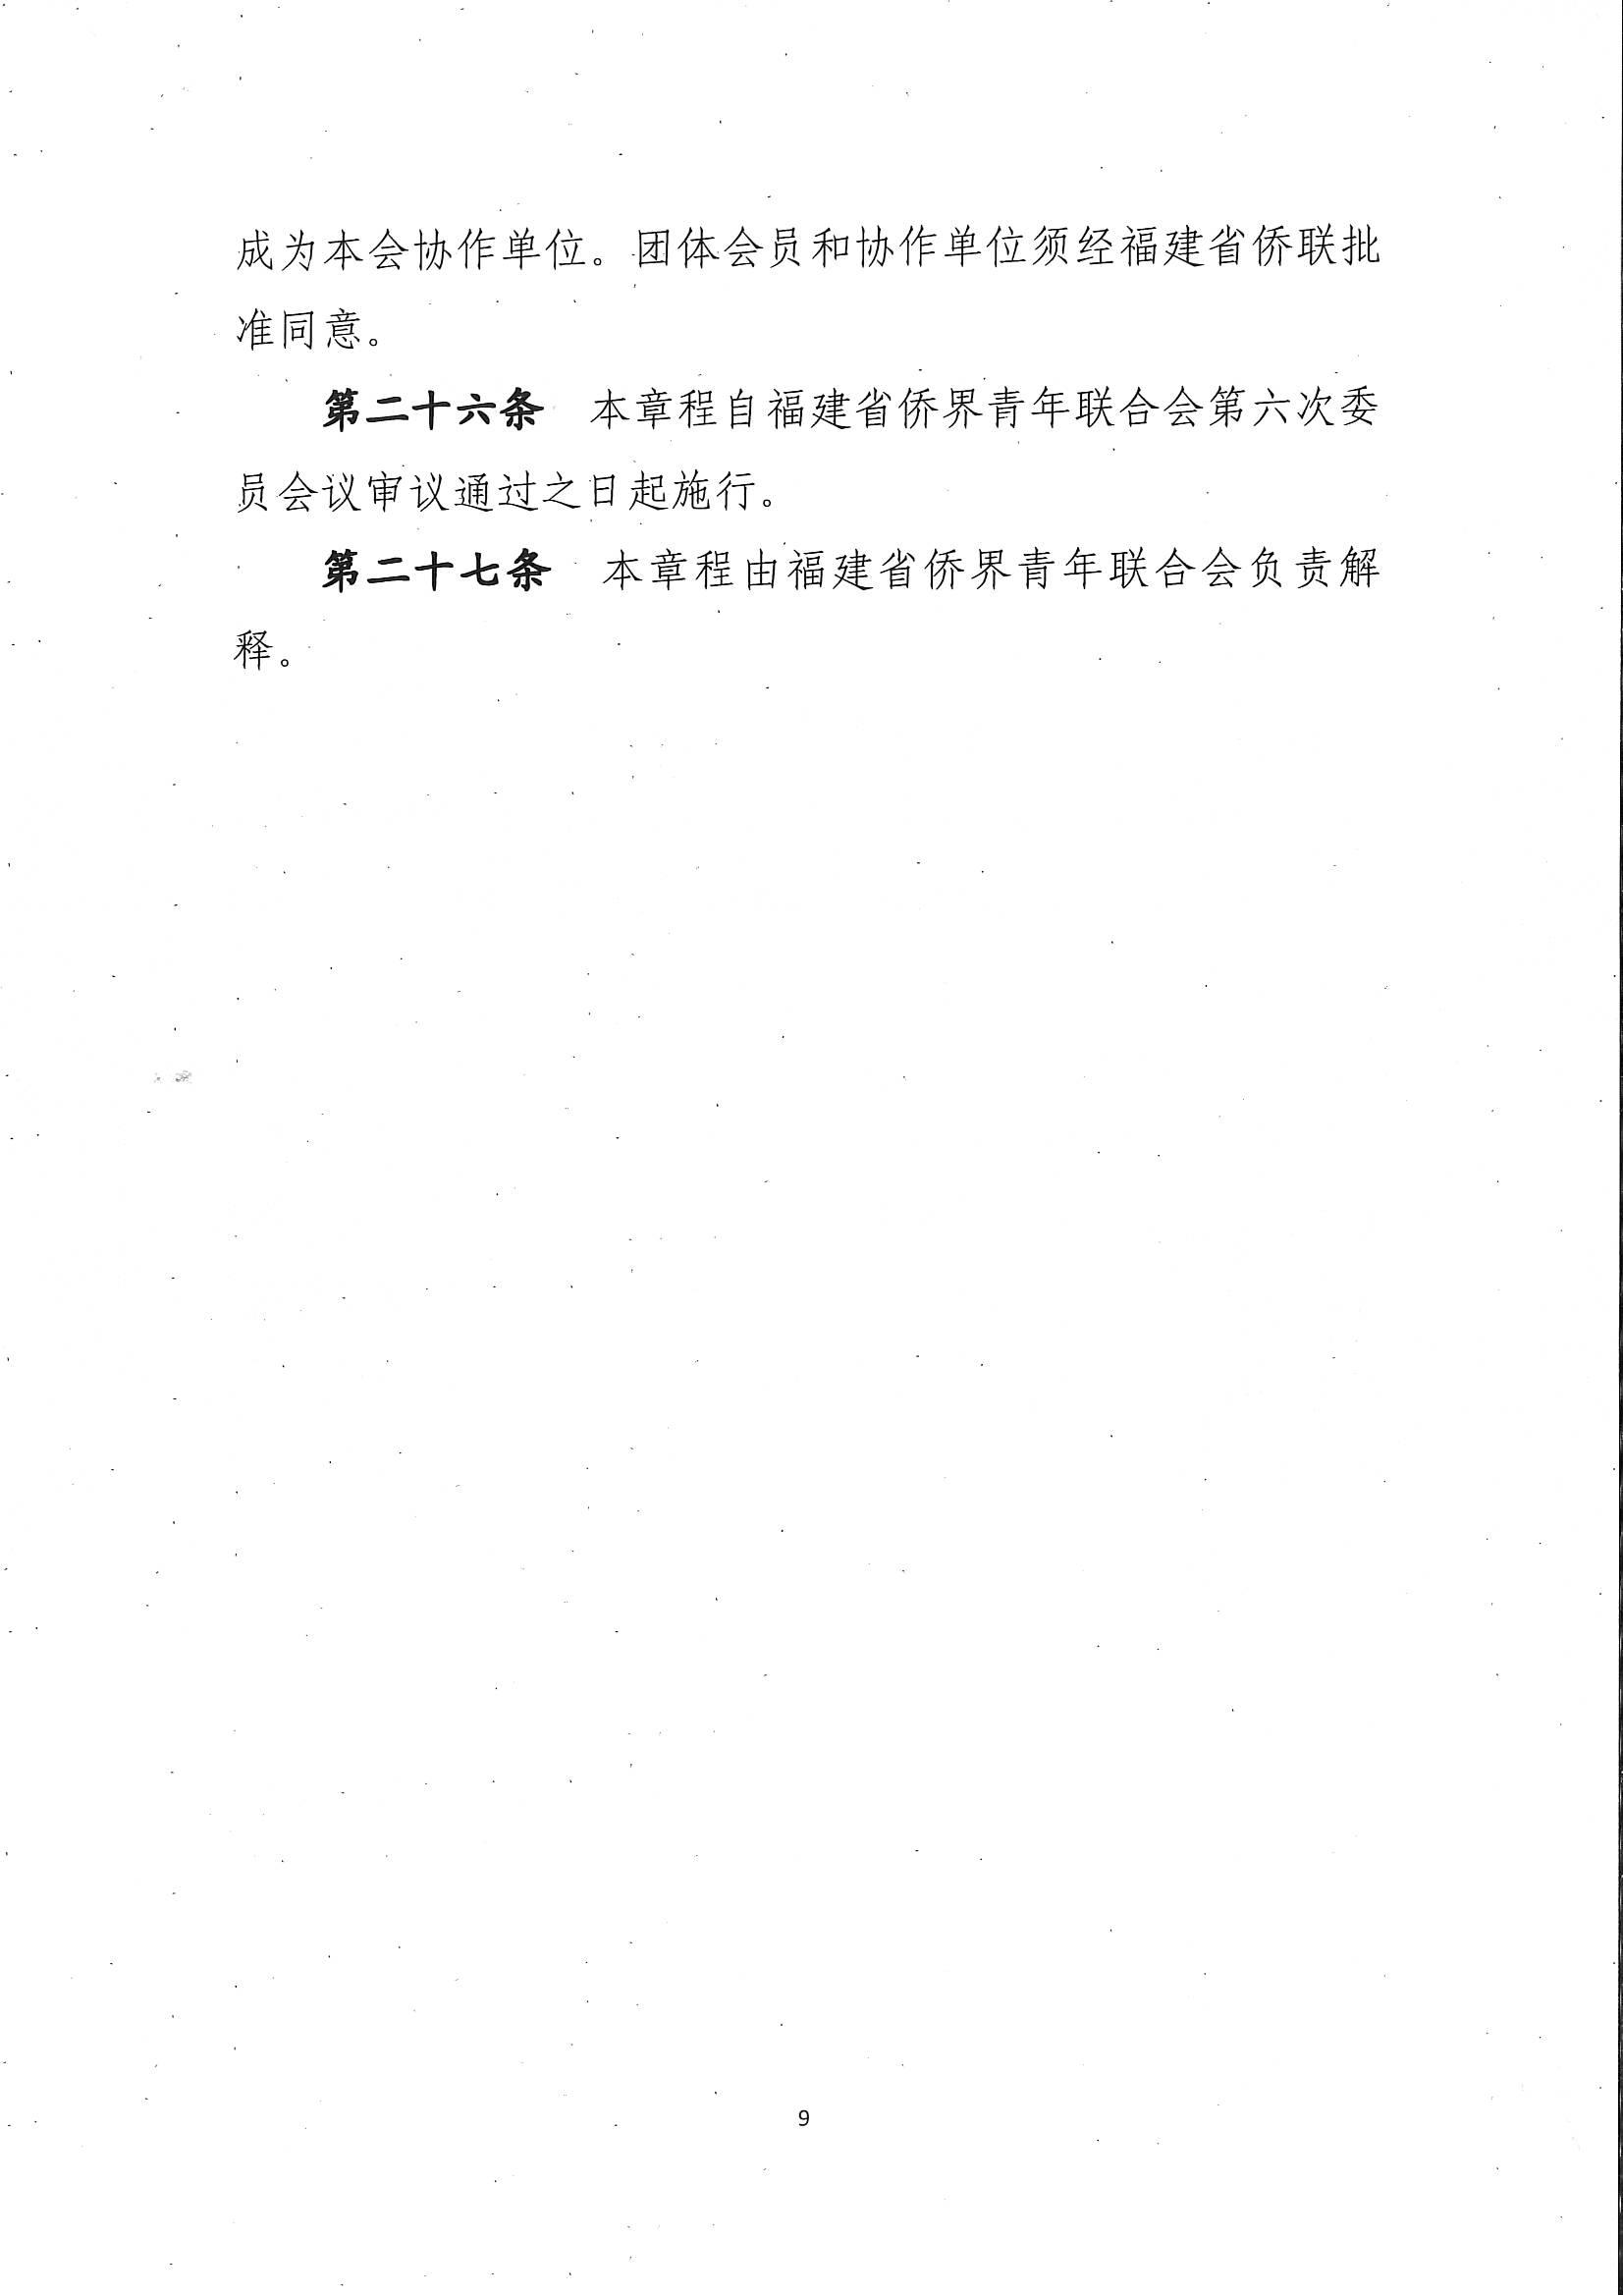 MX-M2608U_20200812_182131_页面_09.jpg